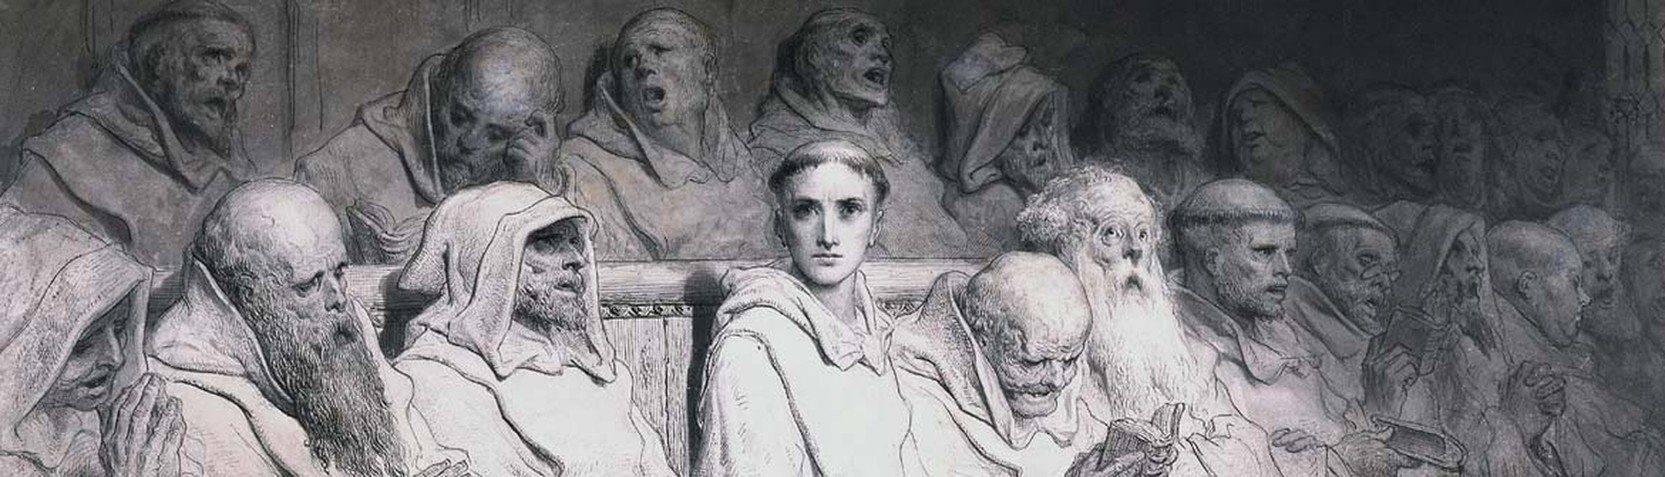 Artistas - Gustave Doré